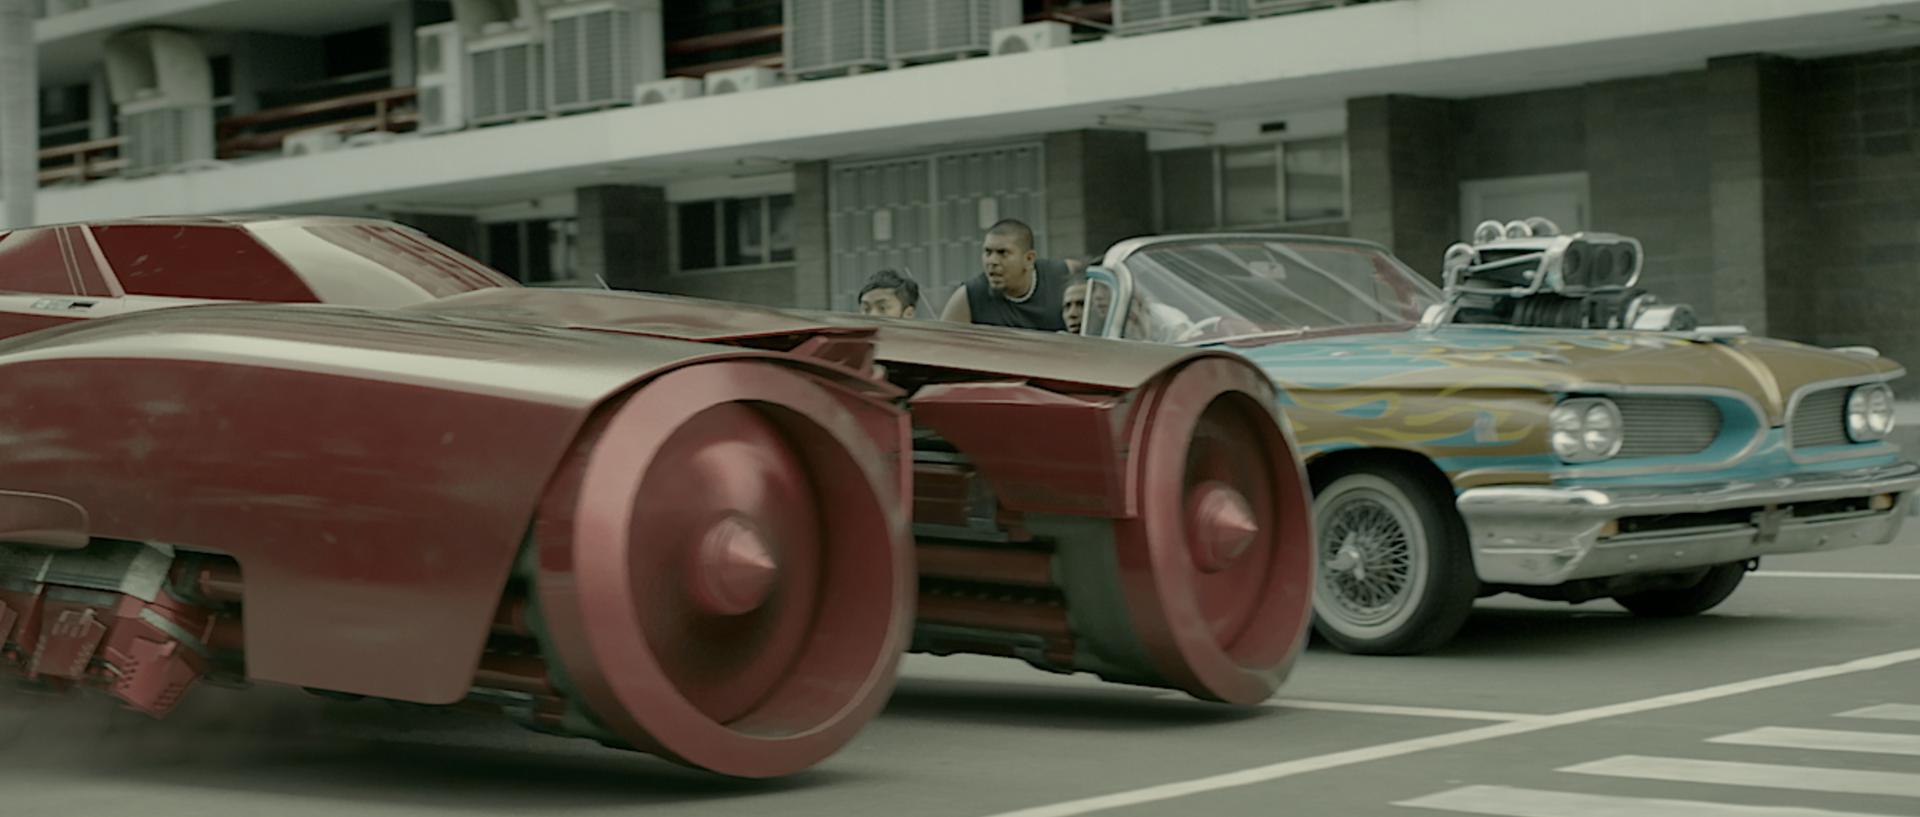 Red O - Car